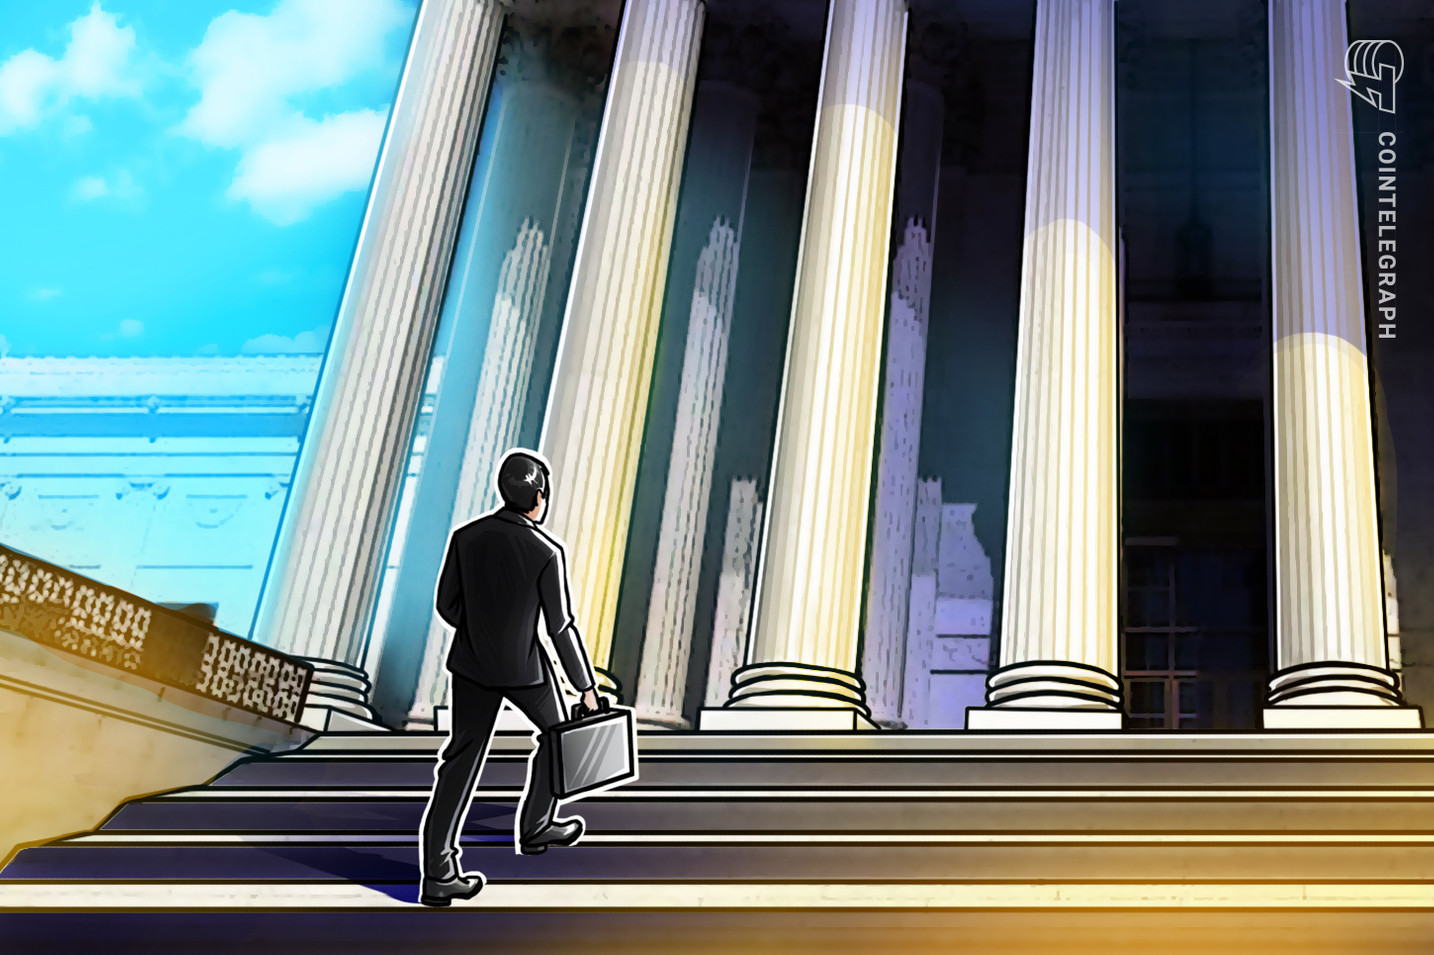 La empresa acusada por sus inversores de ser un esquema Ponzi ahora se enfrenta a la SEC